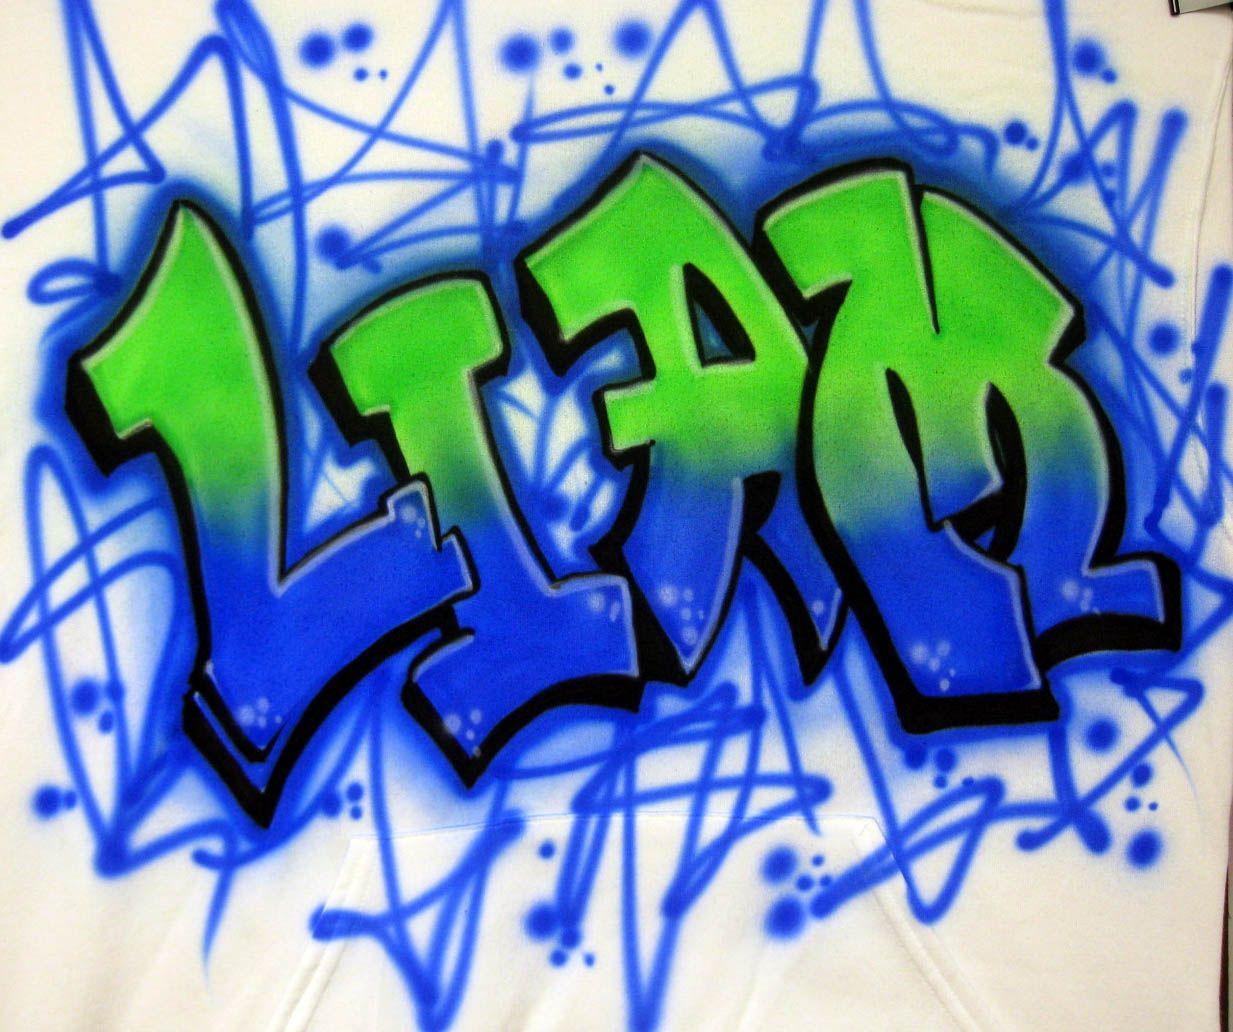 Airbrush Graffiti Design Street Art